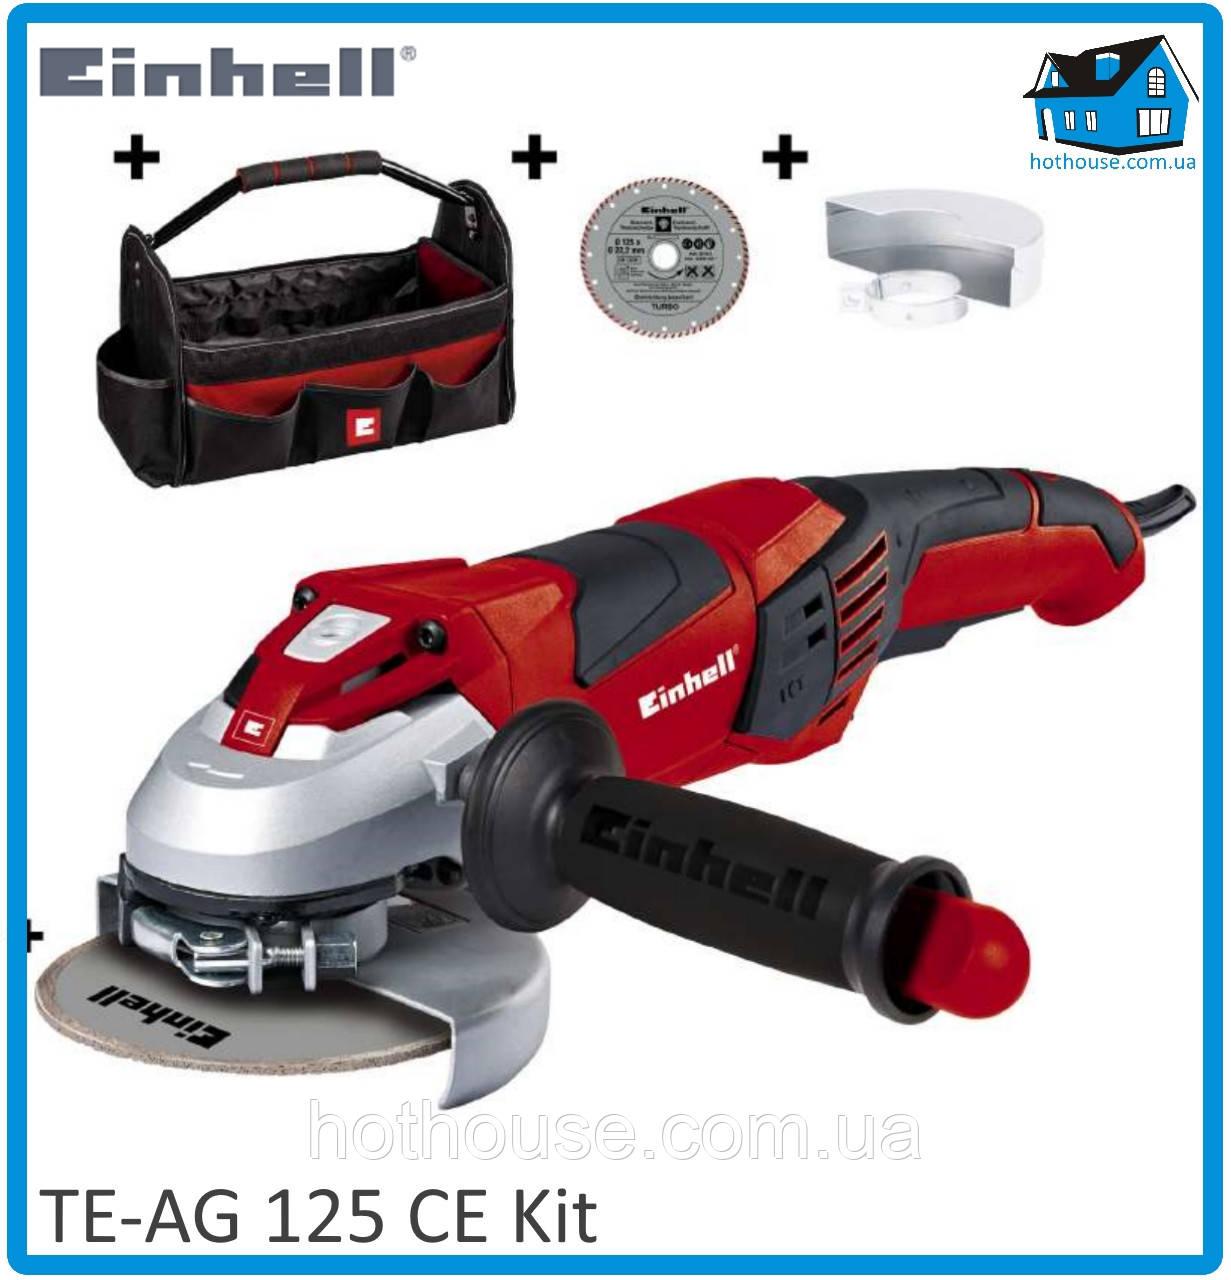 Угловая шлифмашина (болгарка) Einhell TE-AG 125 CE Kit